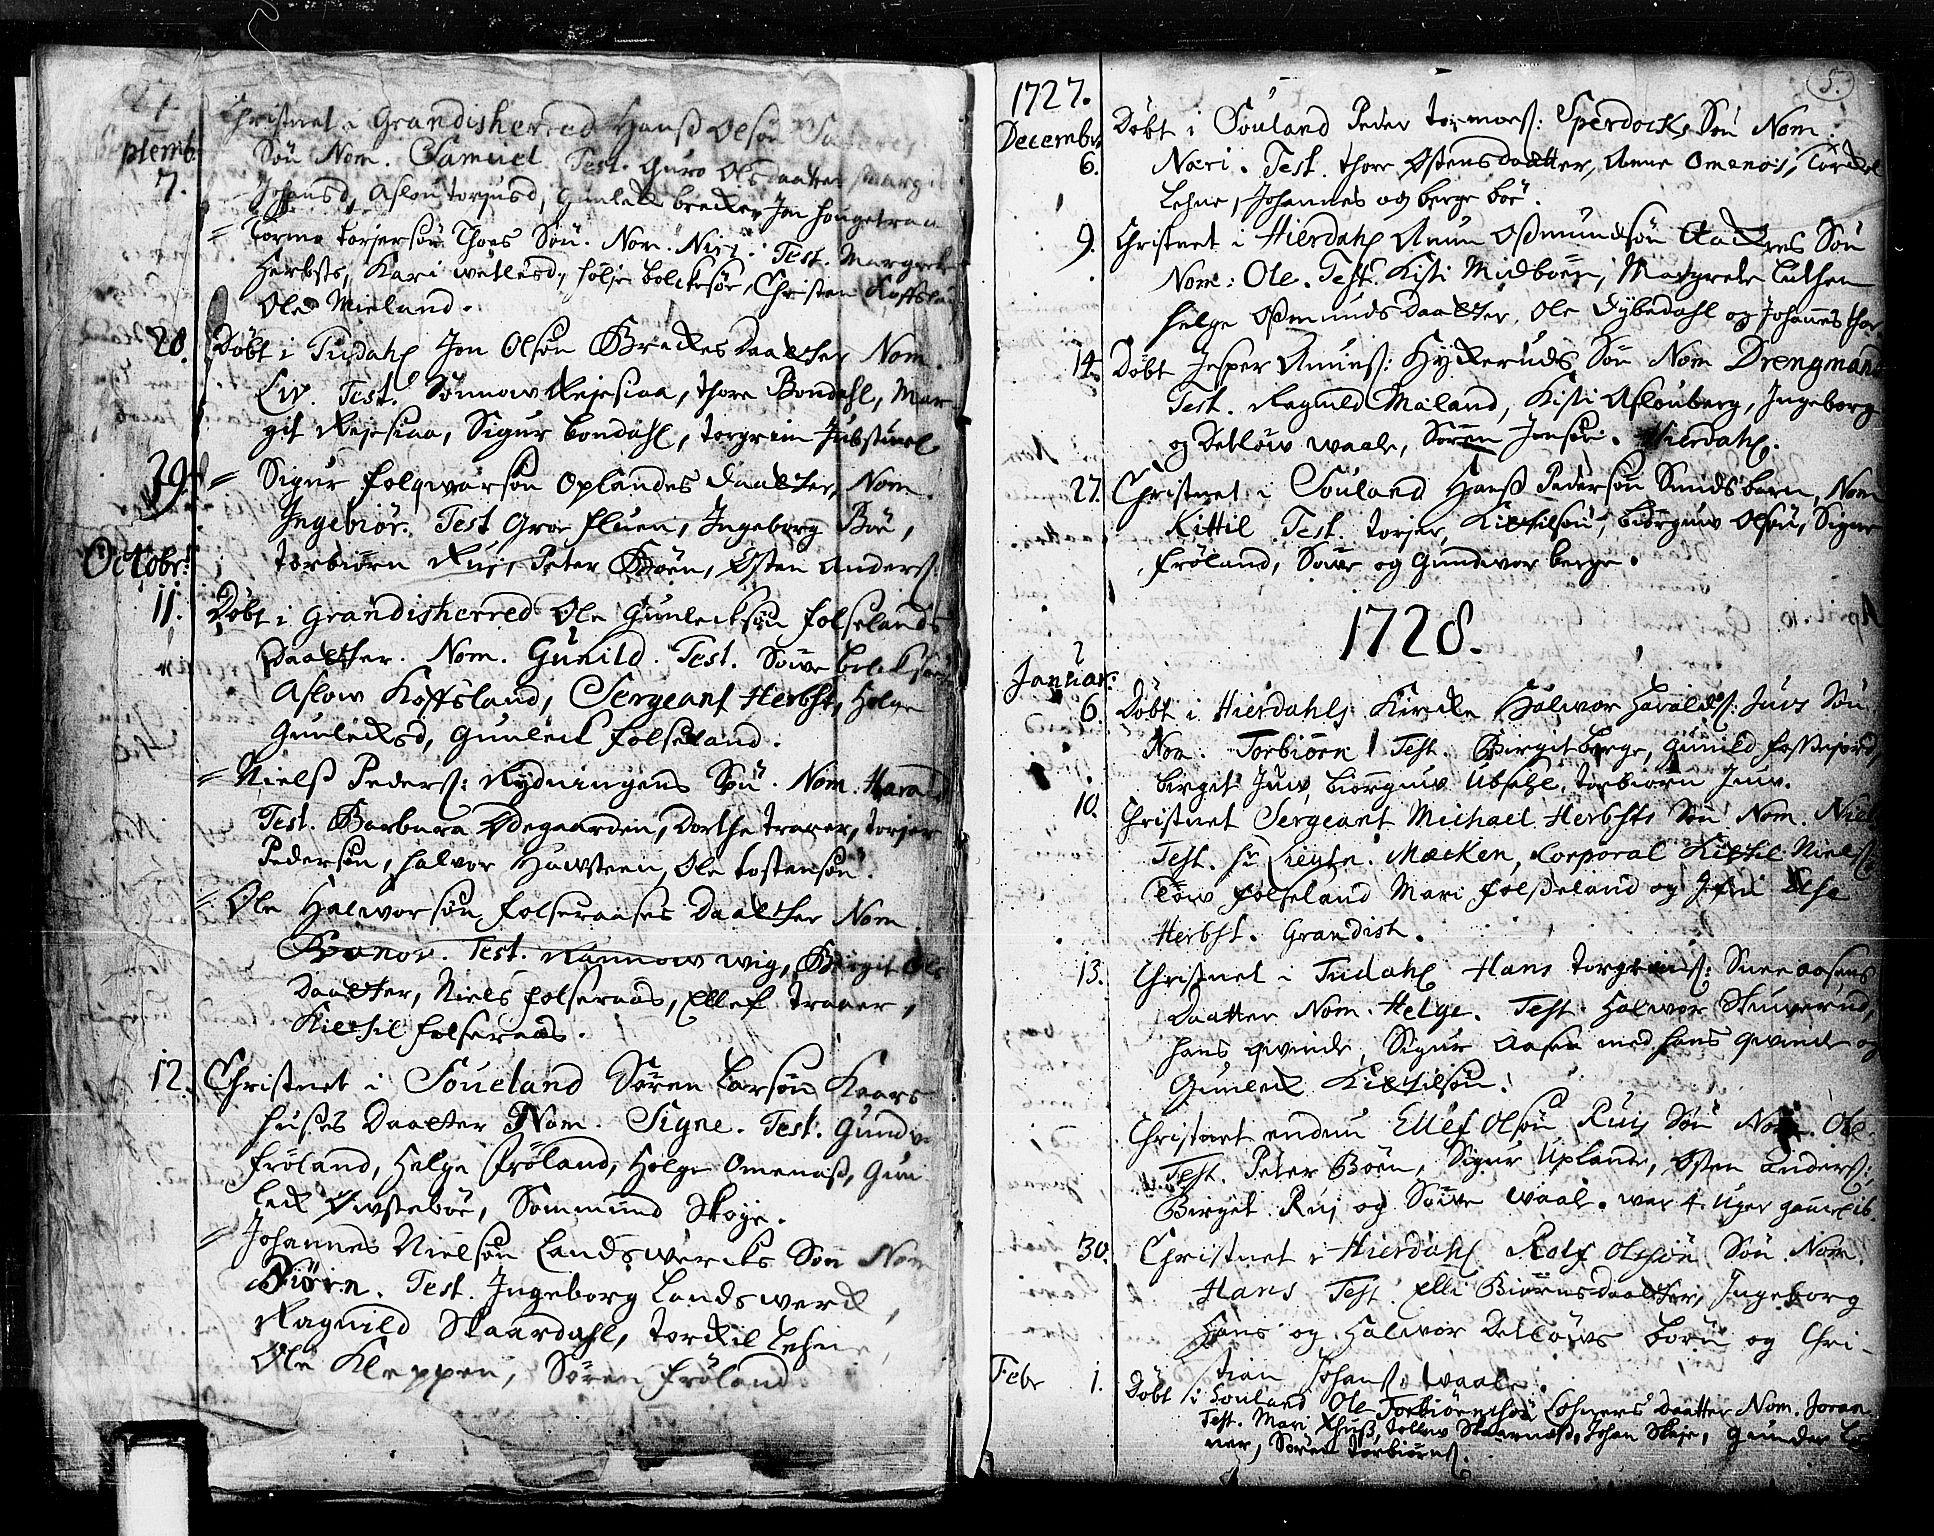 SAKO, Hjartdal kirkebøker, F/Fa/L0003: Ministerialbok nr. I 3, 1727-1775, s. 5